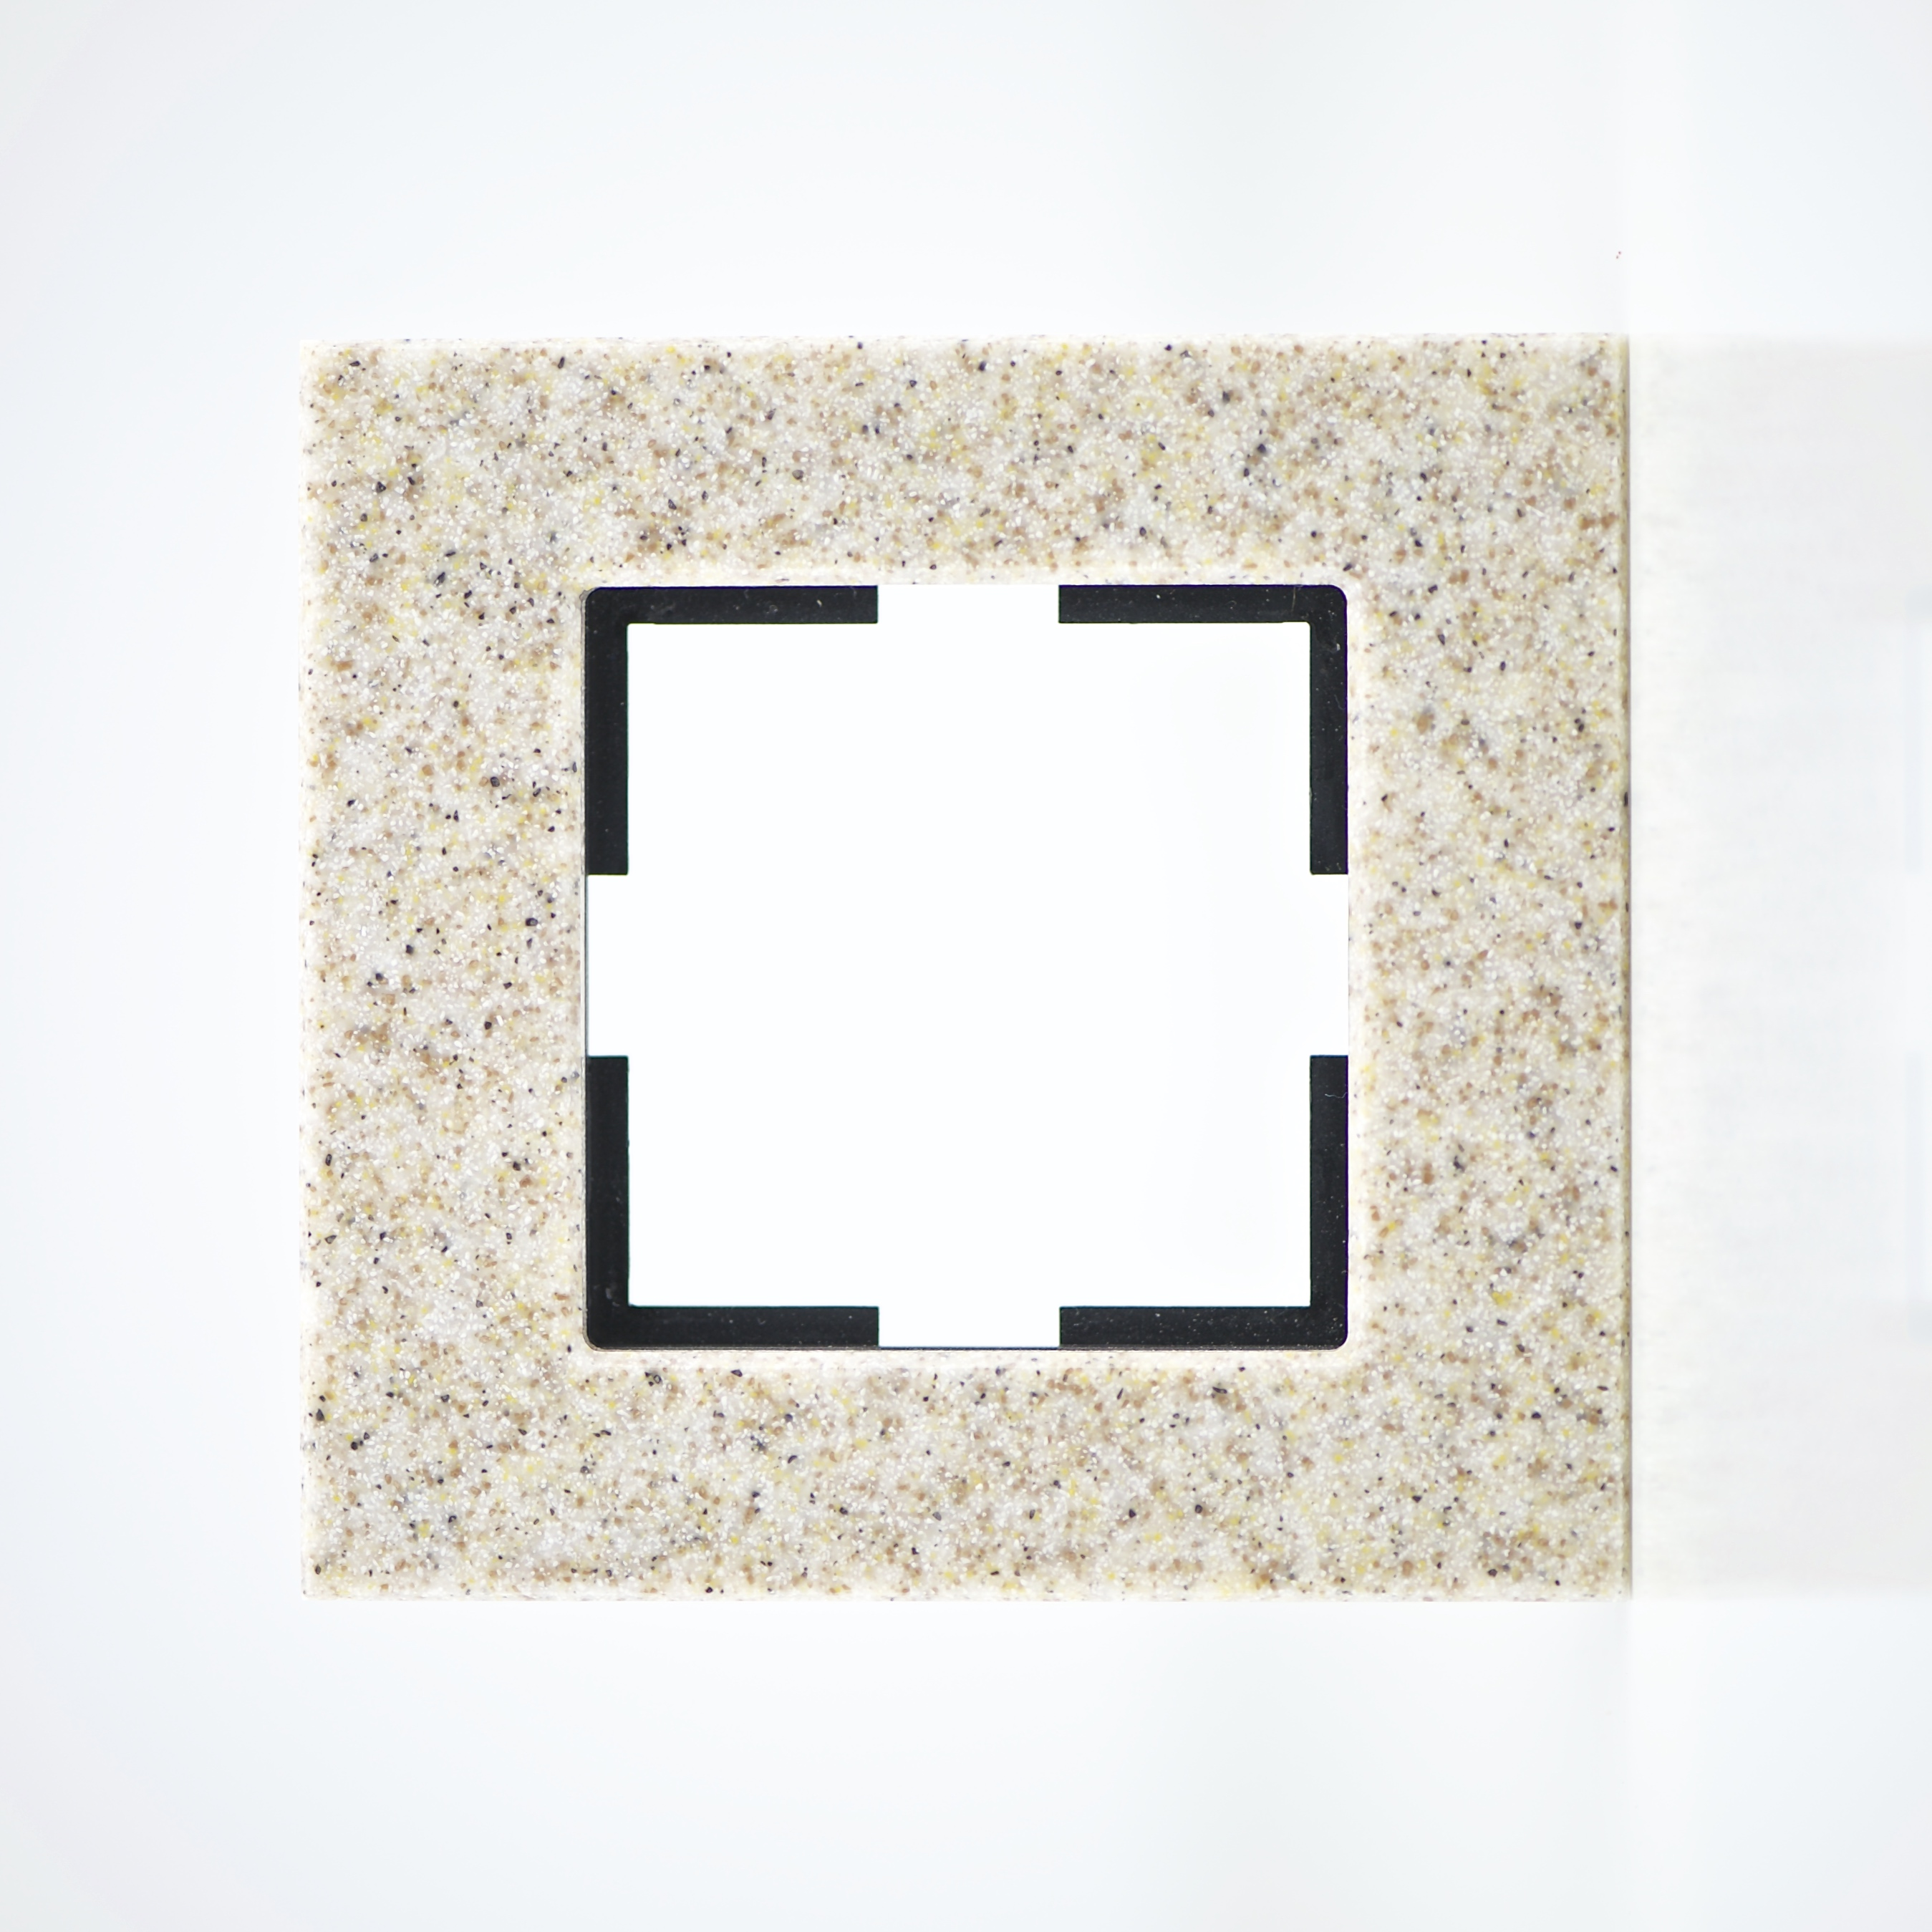 plaque de finition simple corian gr s top prix. Black Bedroom Furniture Sets. Home Design Ideas